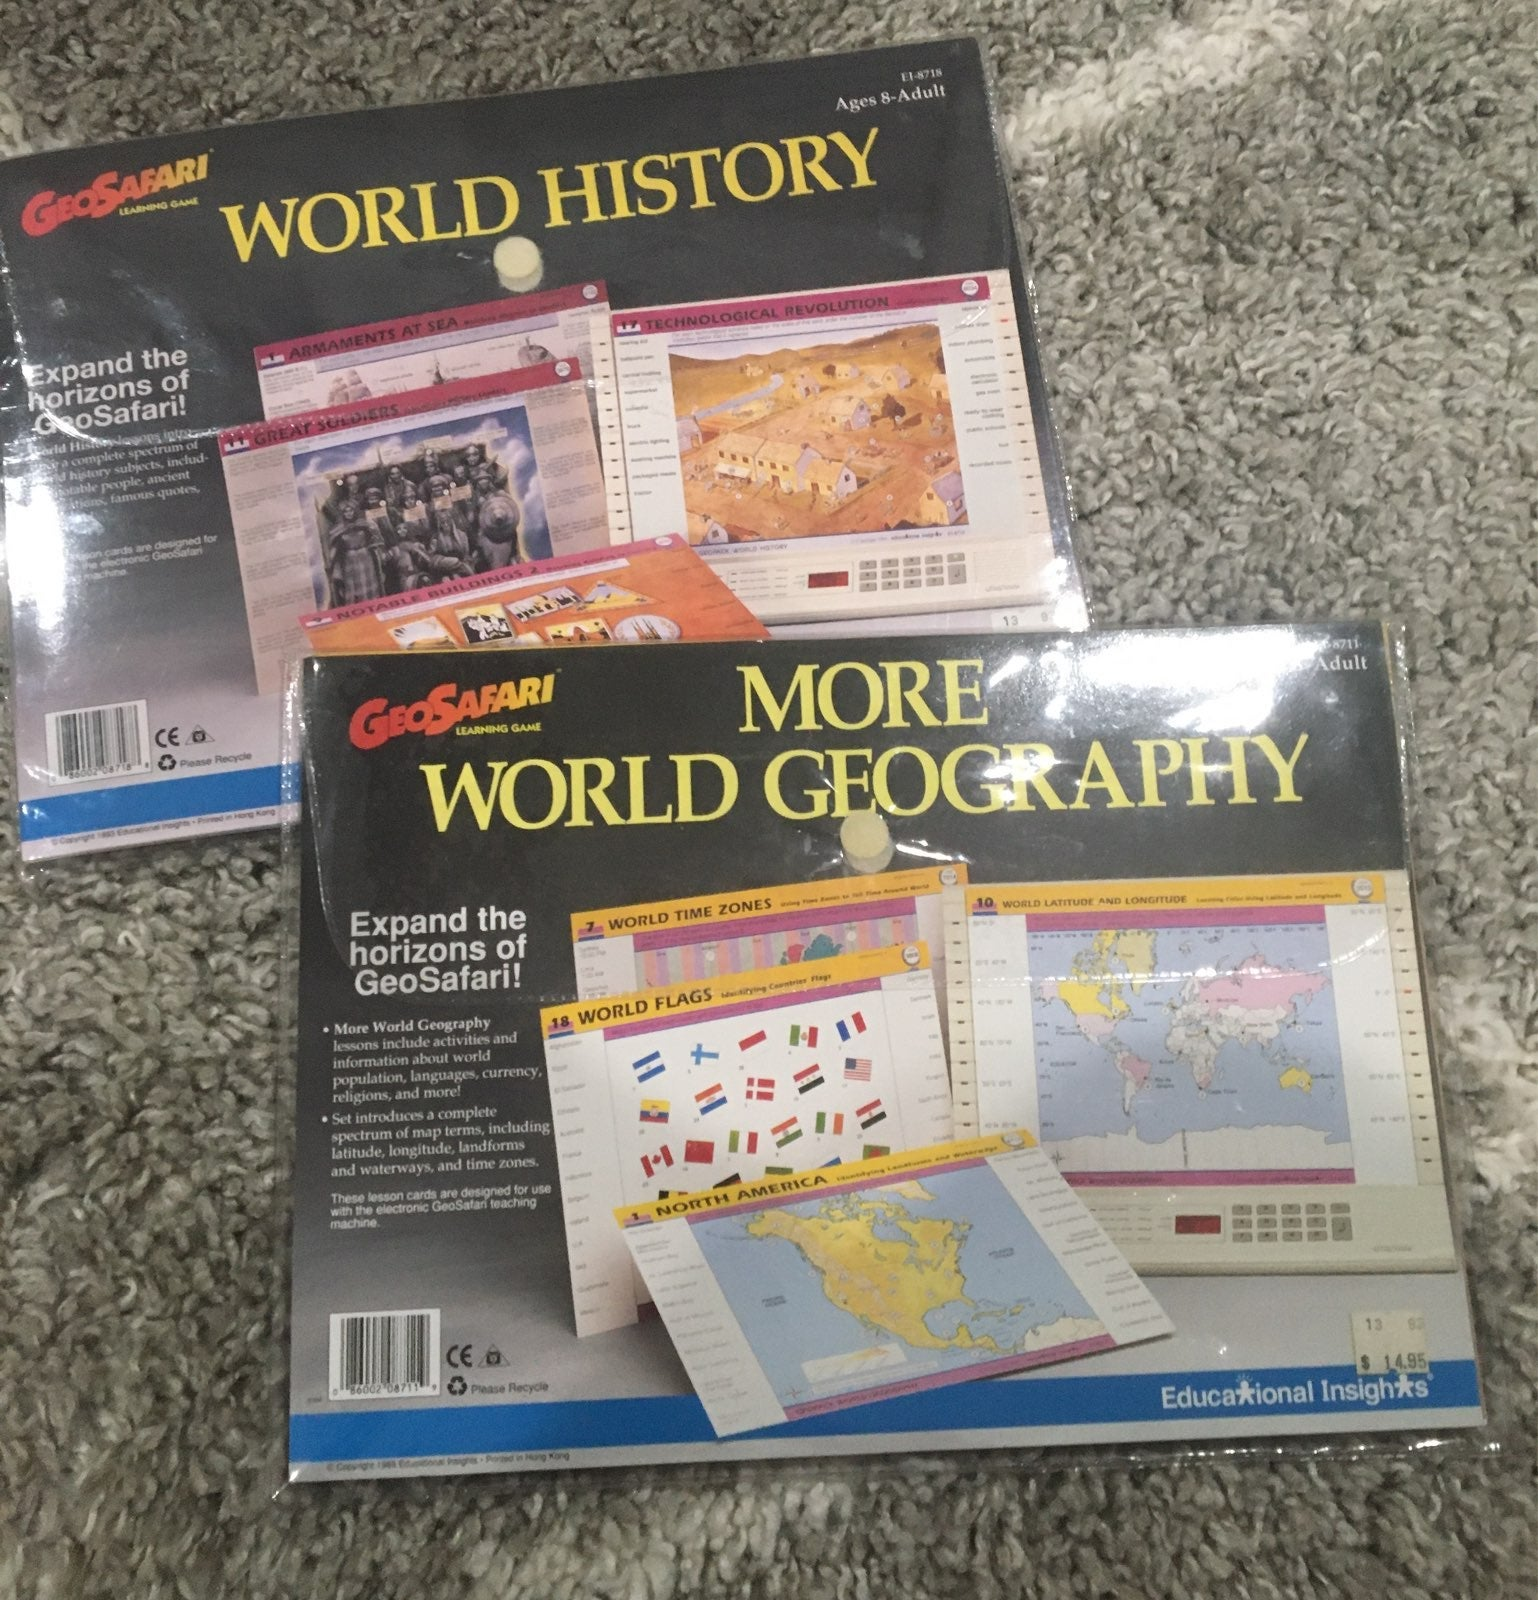 GeoSafari: World Geography & History